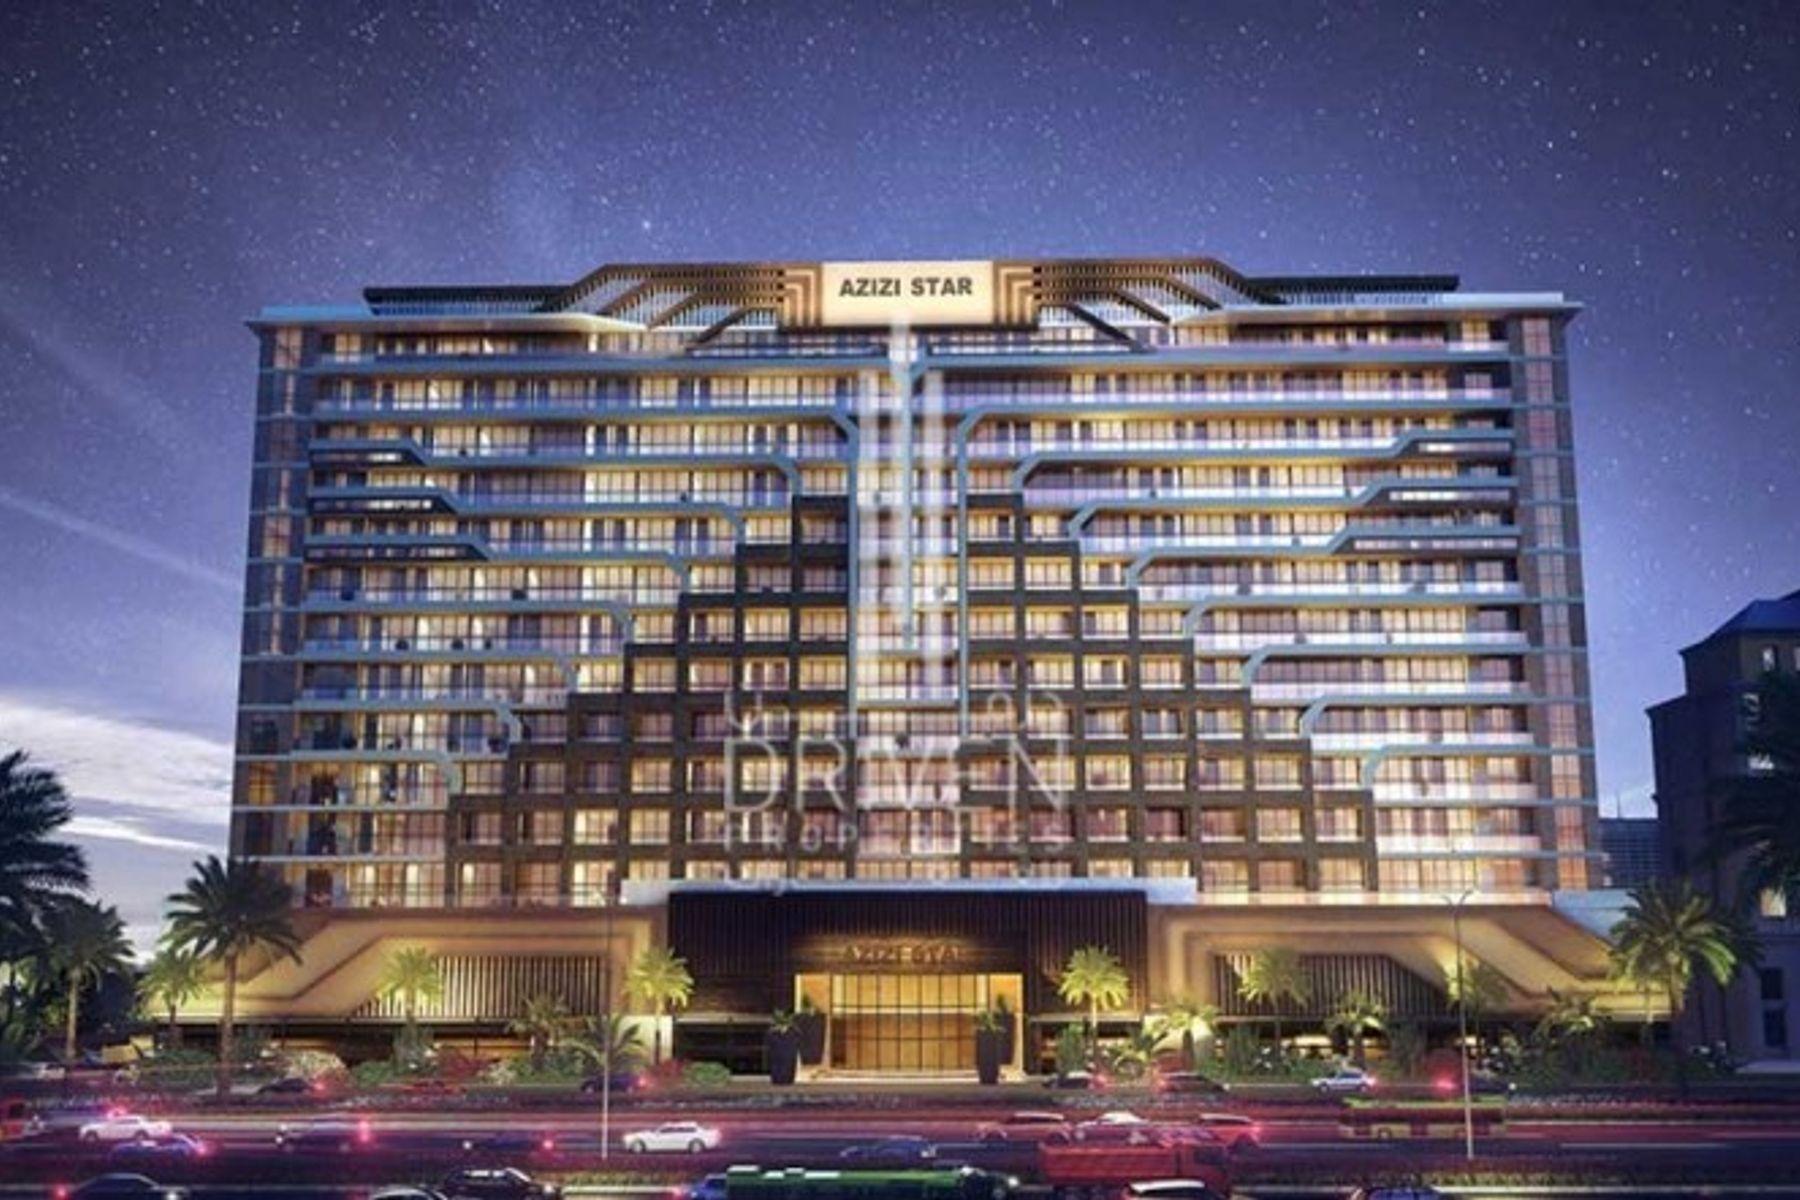 Hotel apartment for Sale in Azizi Star - Al Furjan